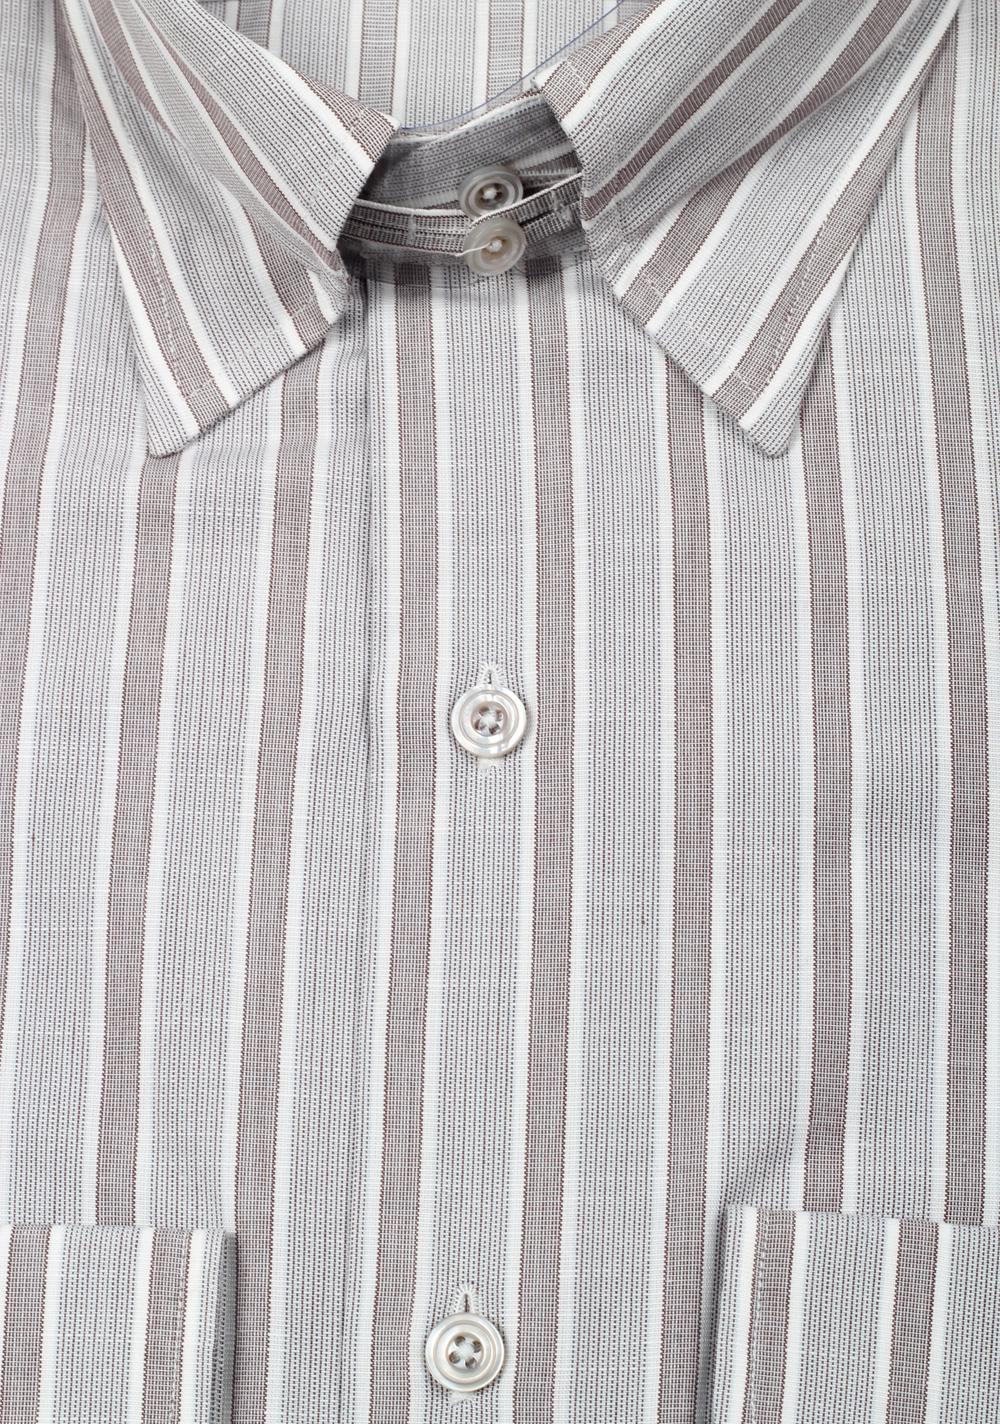 TOM FORD Striped Gray High Collar Dress Shirt Size 40 / 15,75 U.S.   Costume Limité